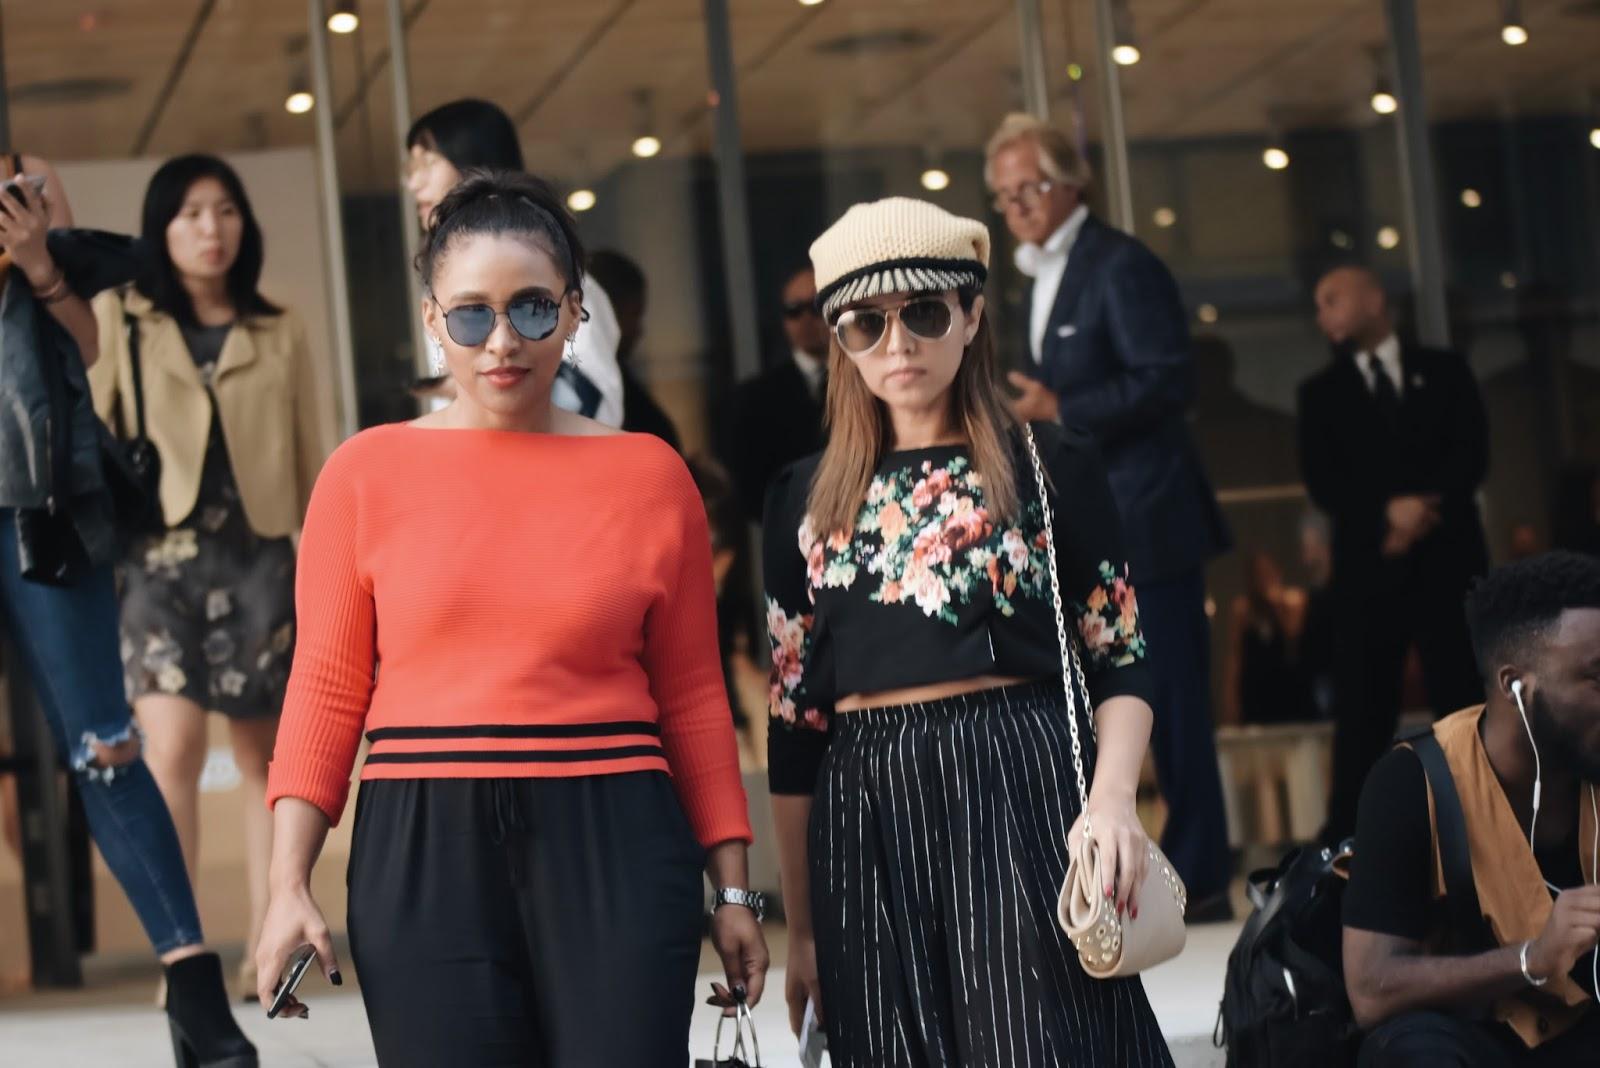 new york fashion week, nyfw, nyfw 2018, spring summer 2018, fashion week, nyfw streetstyle